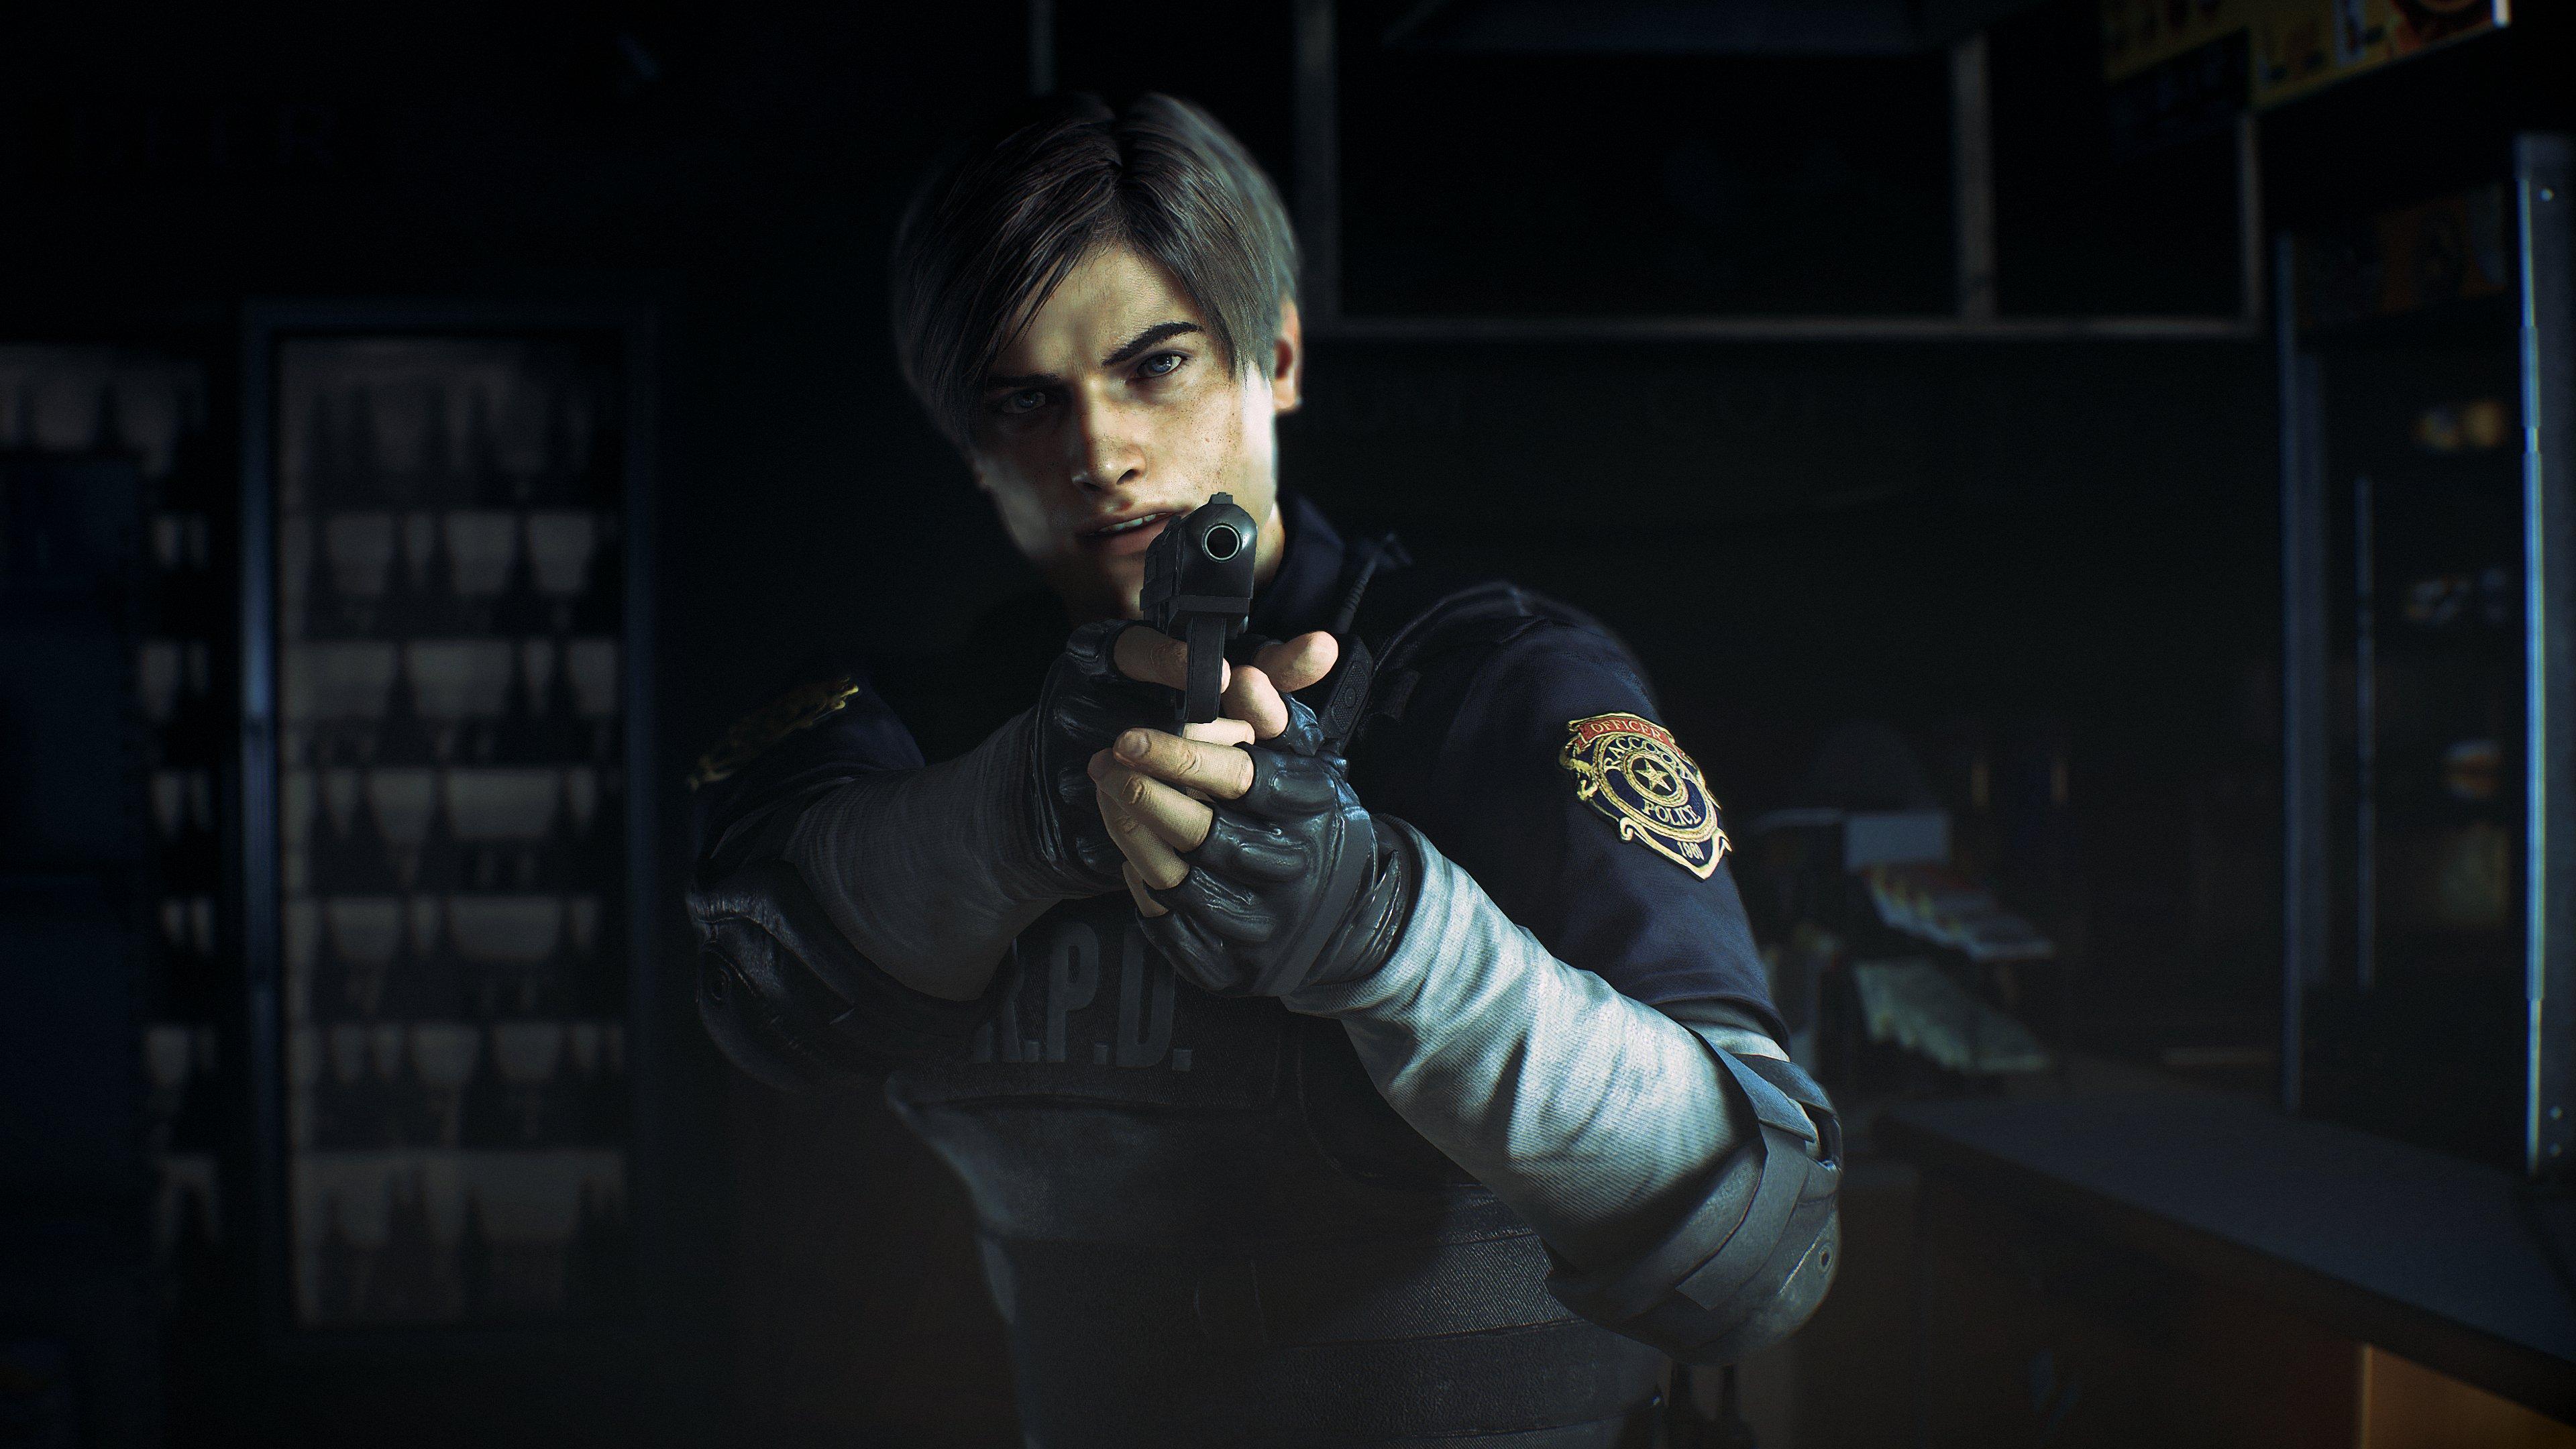 'Resident Evil 2 Remake' no tendrá versión para Nintendo Switch